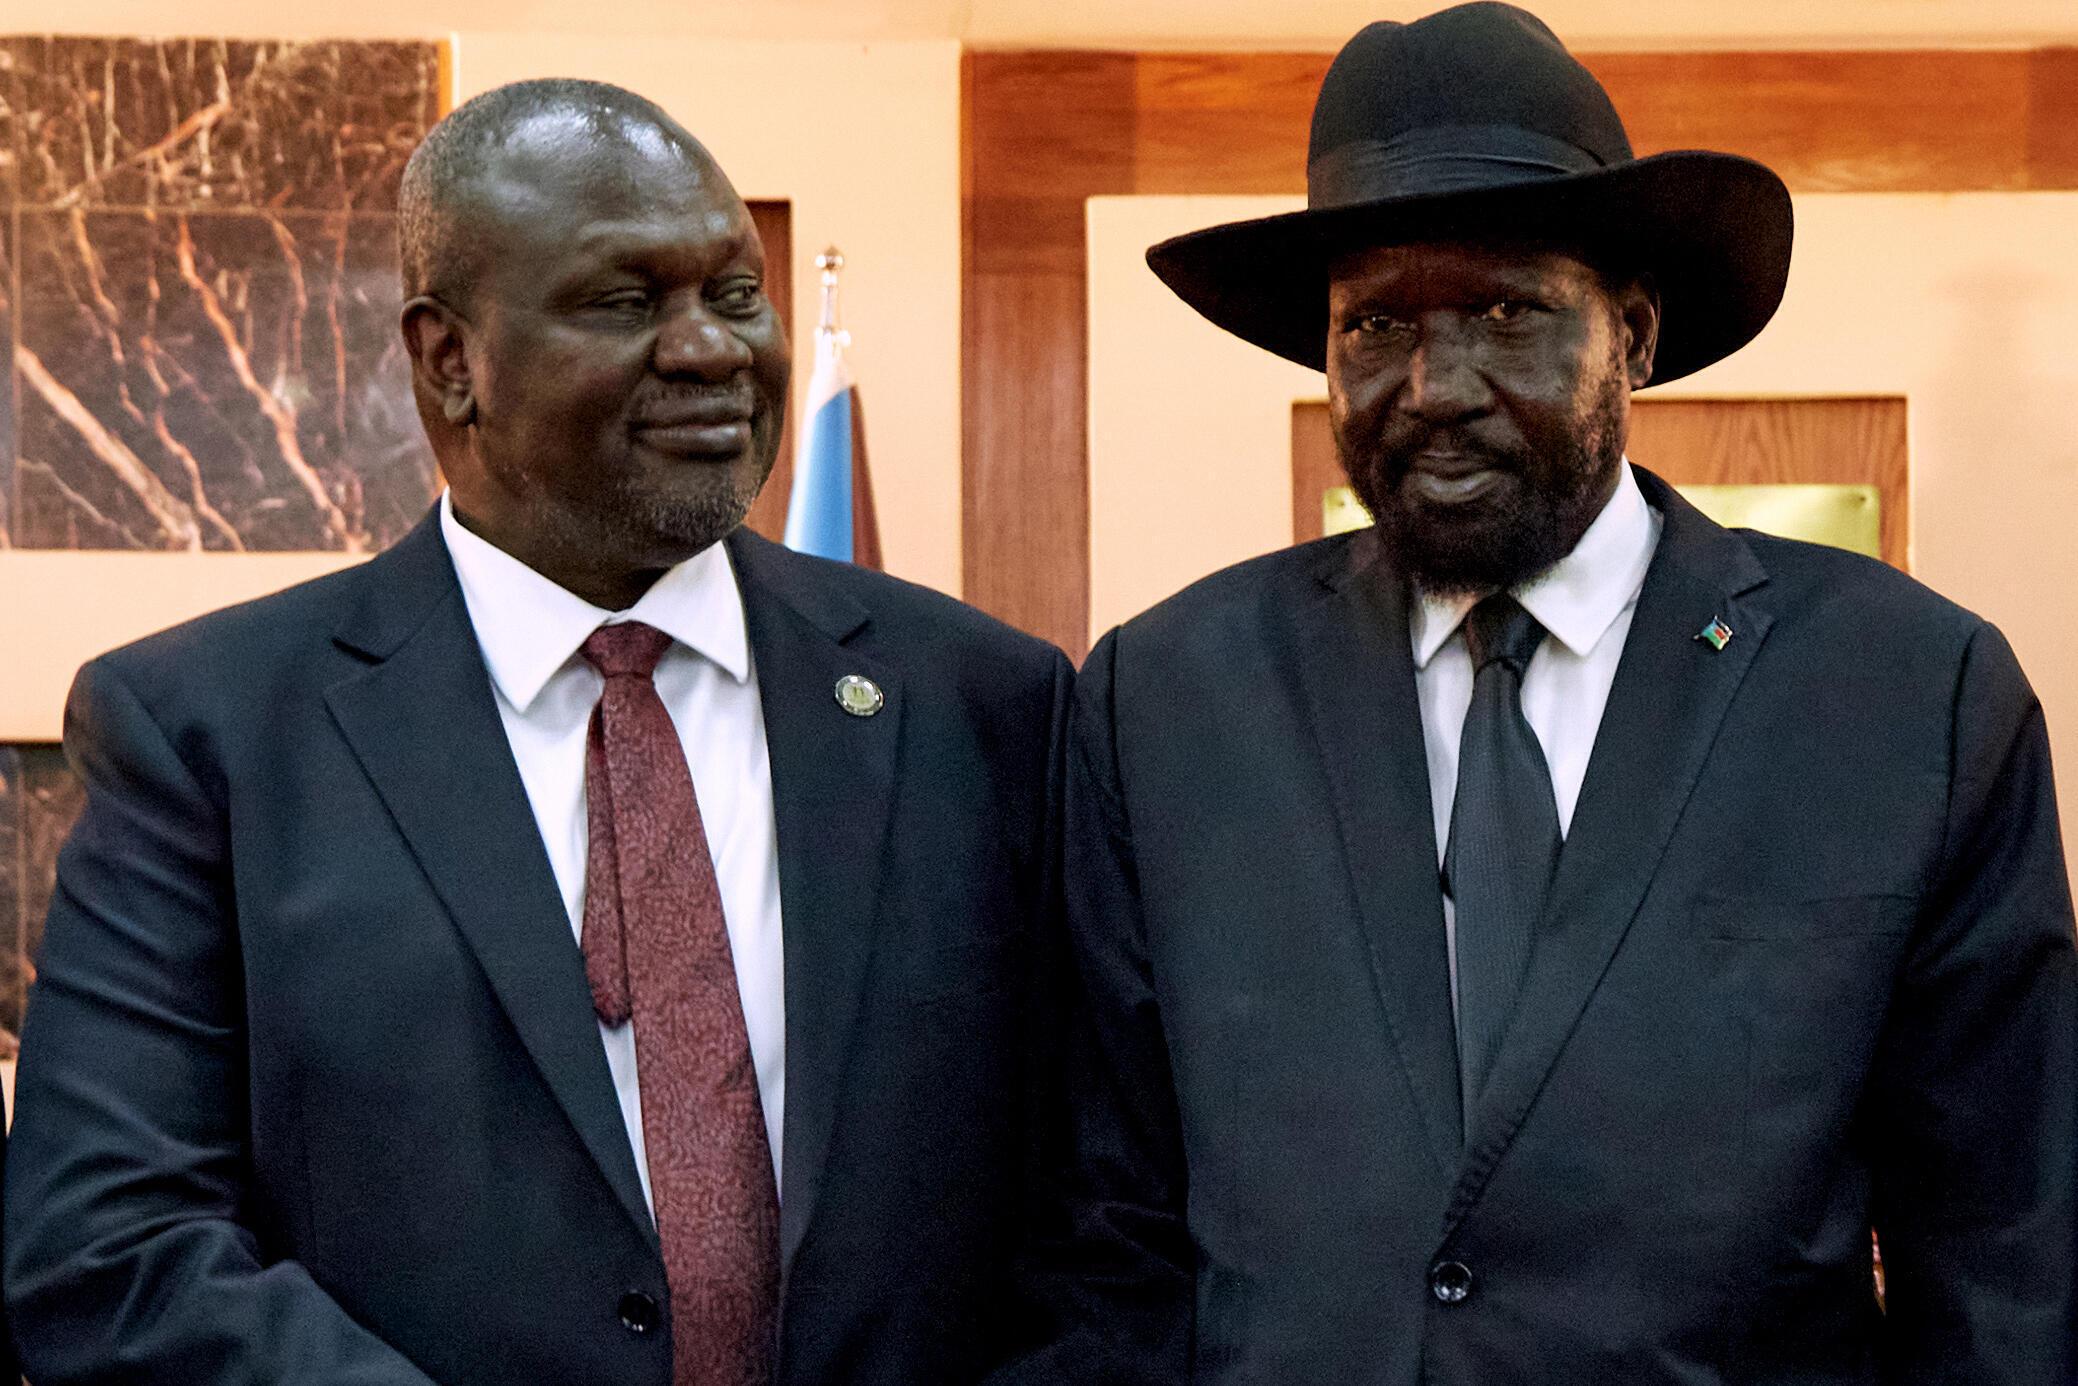 South Sudanese President Salva Kiir (R) shakes hands with First Vice President Riek Machar in 2020